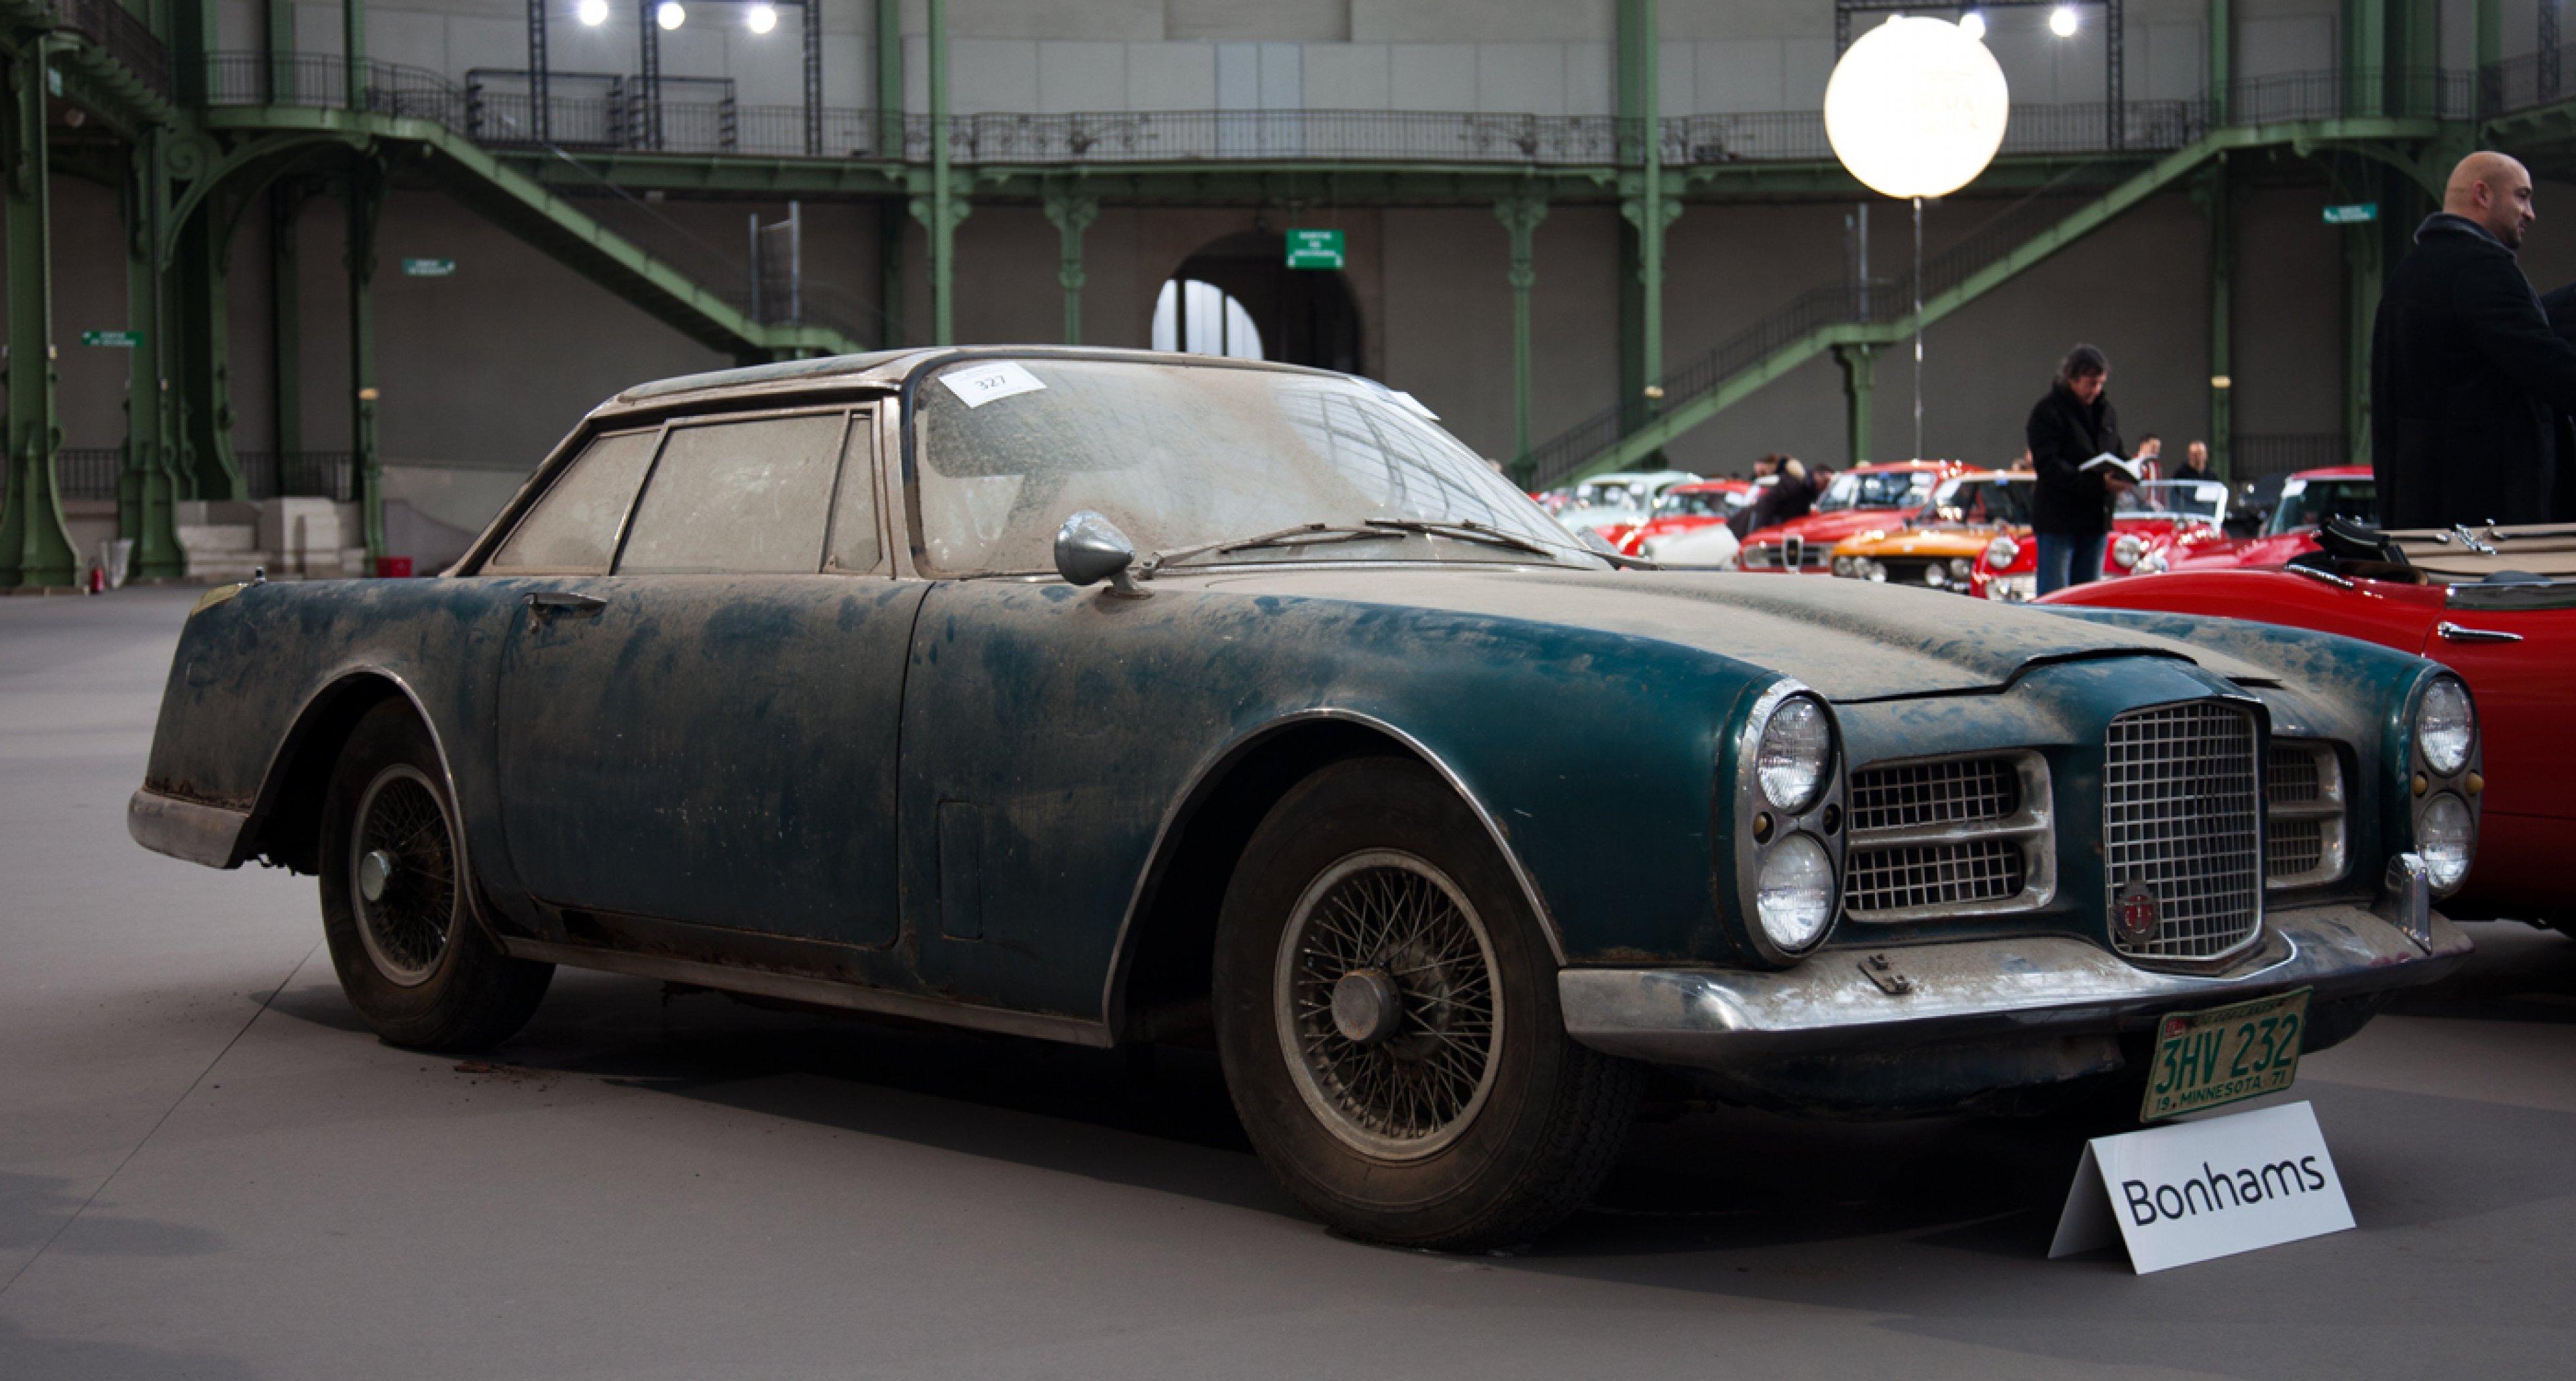 In need of TLC: 1962 Facel Vega Facel II Coupe (sold for €155,250) at Bonhams.